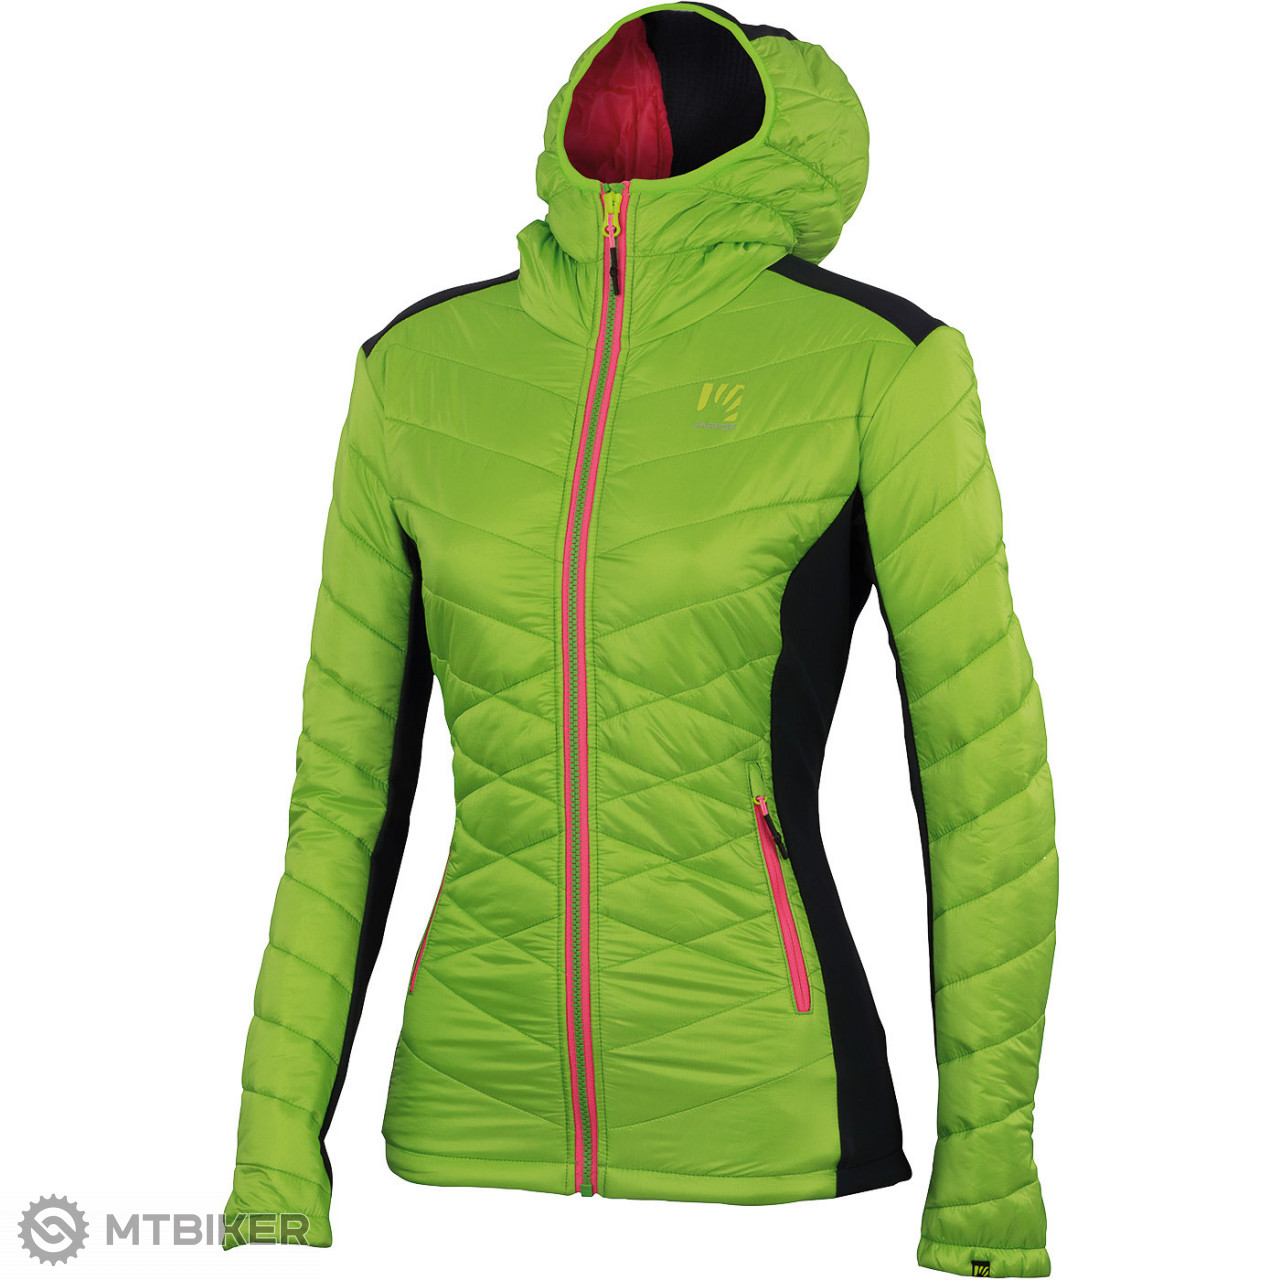 Karpos BURELON bunda dámska svetlozelená antracit - MTBIKER Shop 4ca097d1ab3